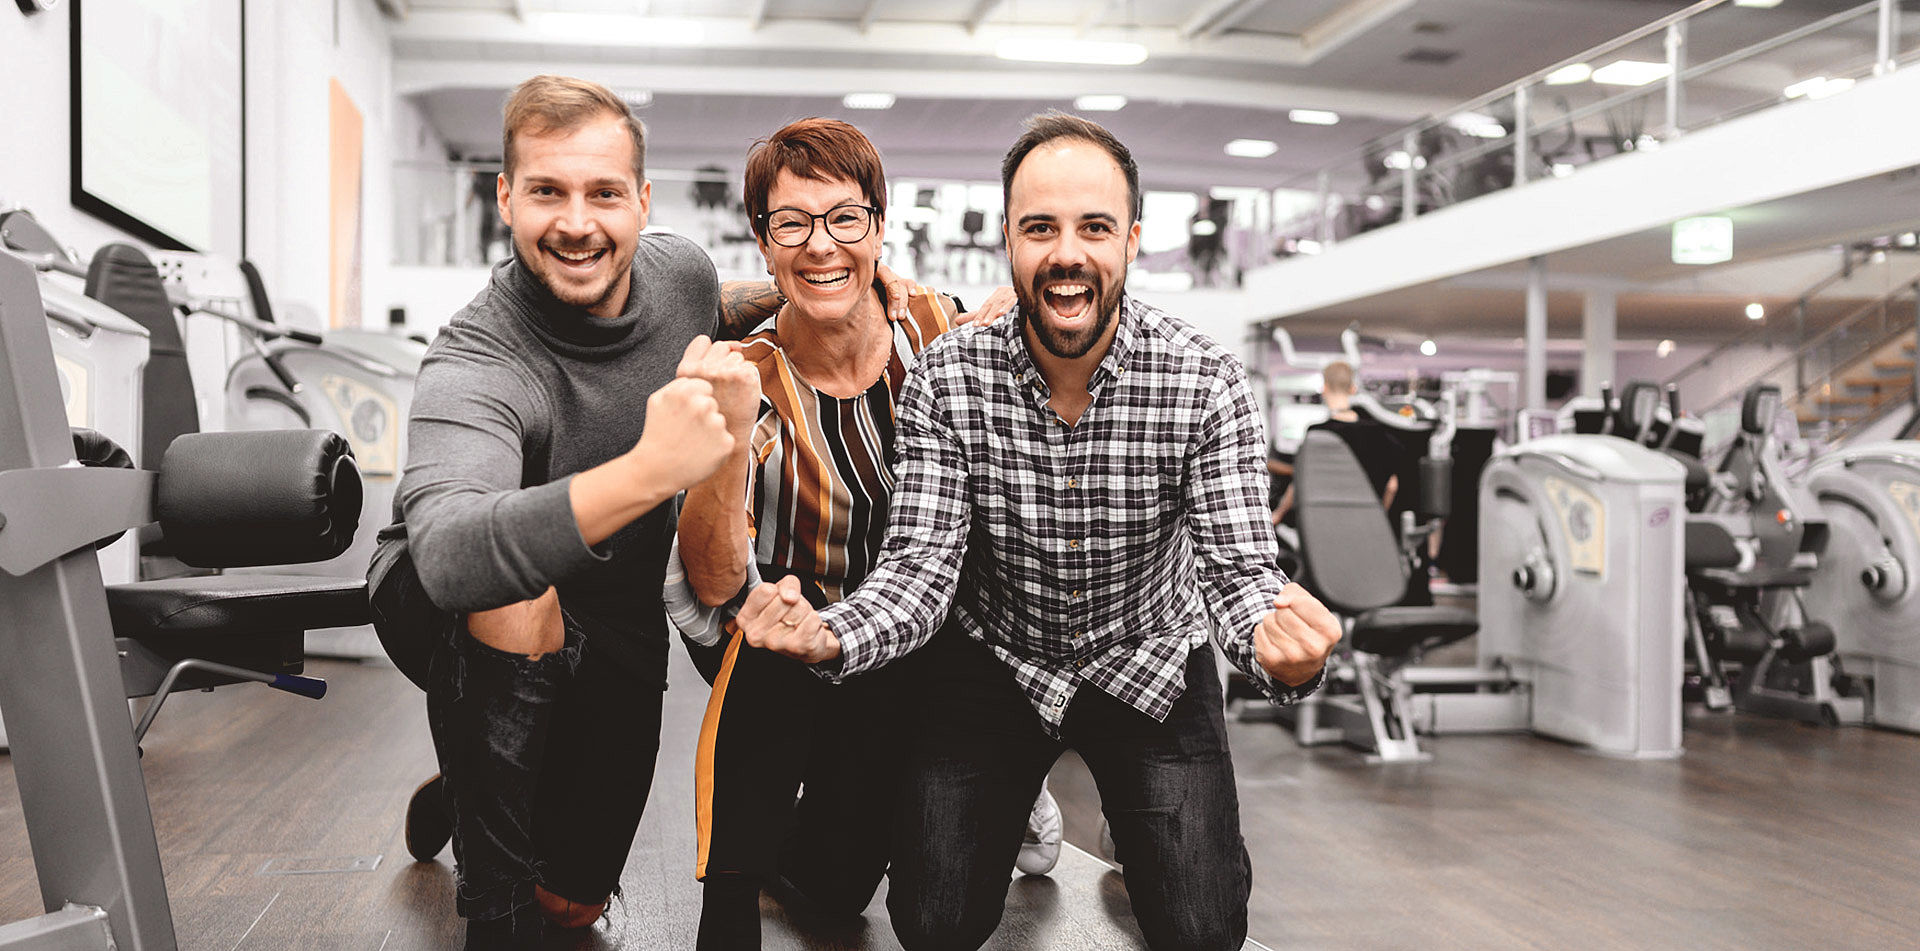 fitness abnehmen gesundheit im fit fun fitnessstudio kassel. Black Bedroom Furniture Sets. Home Design Ideas